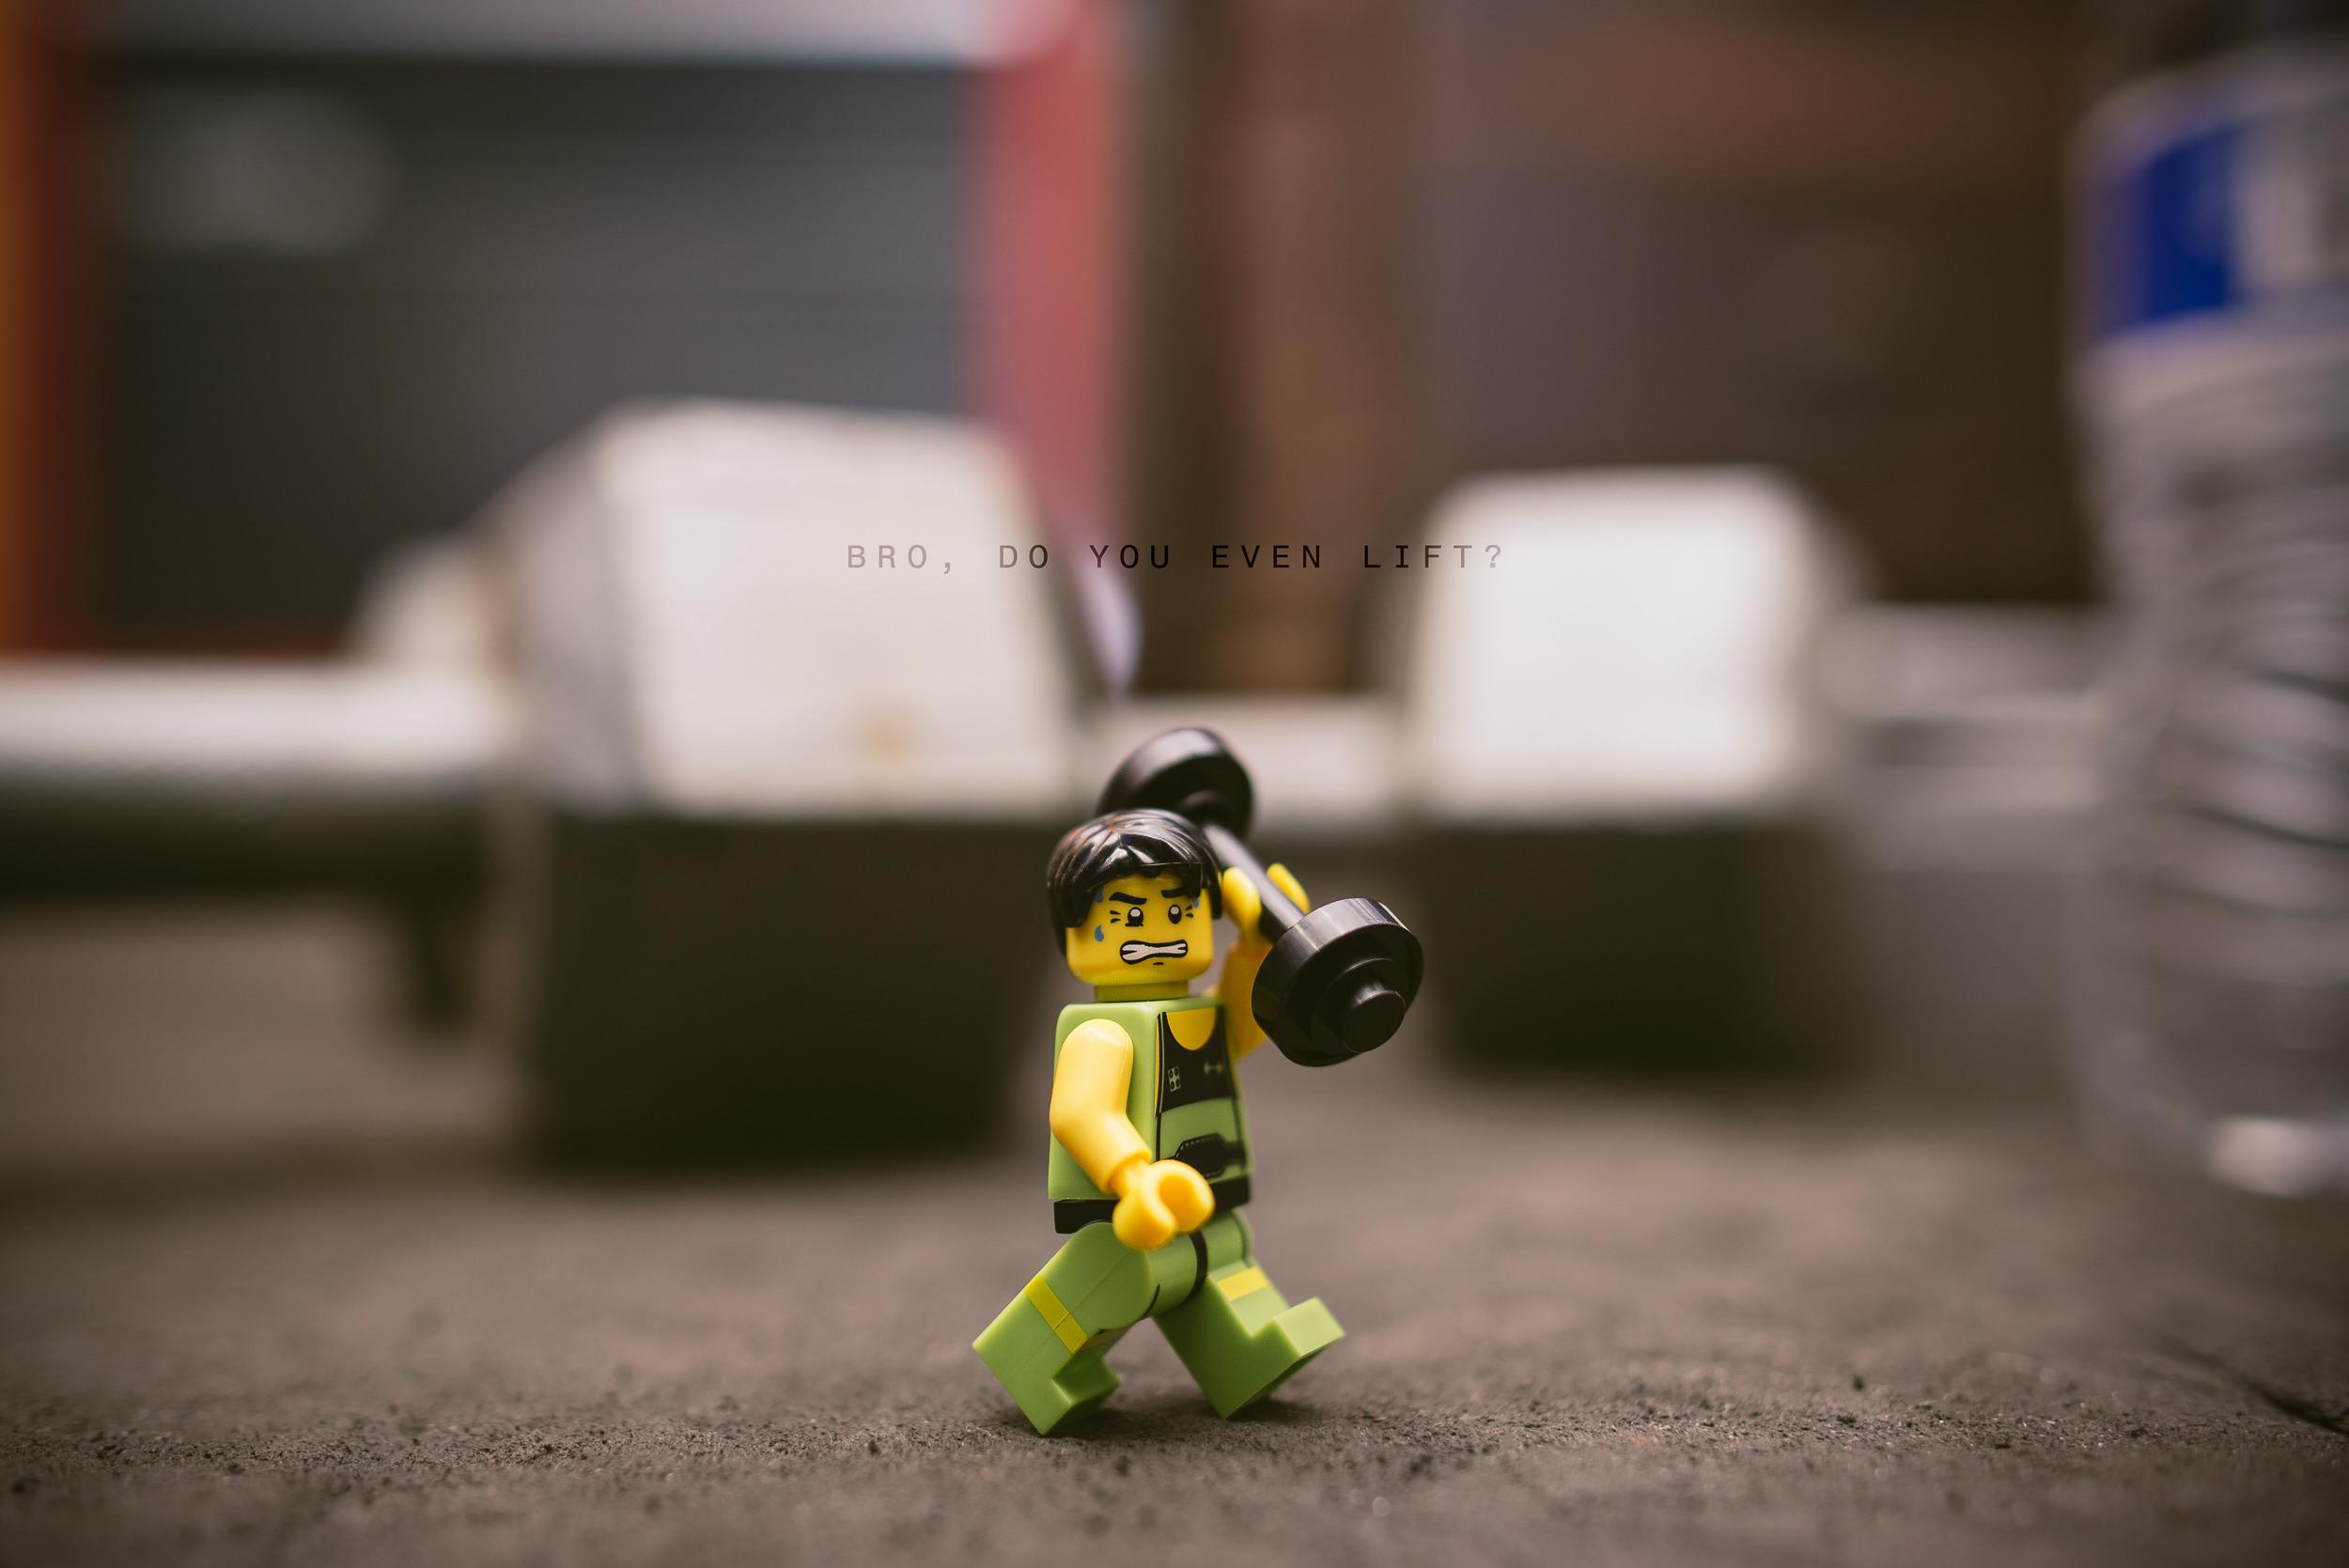 Lego-Portrait-Series-Reggie-Ballesteros-0019.jpg